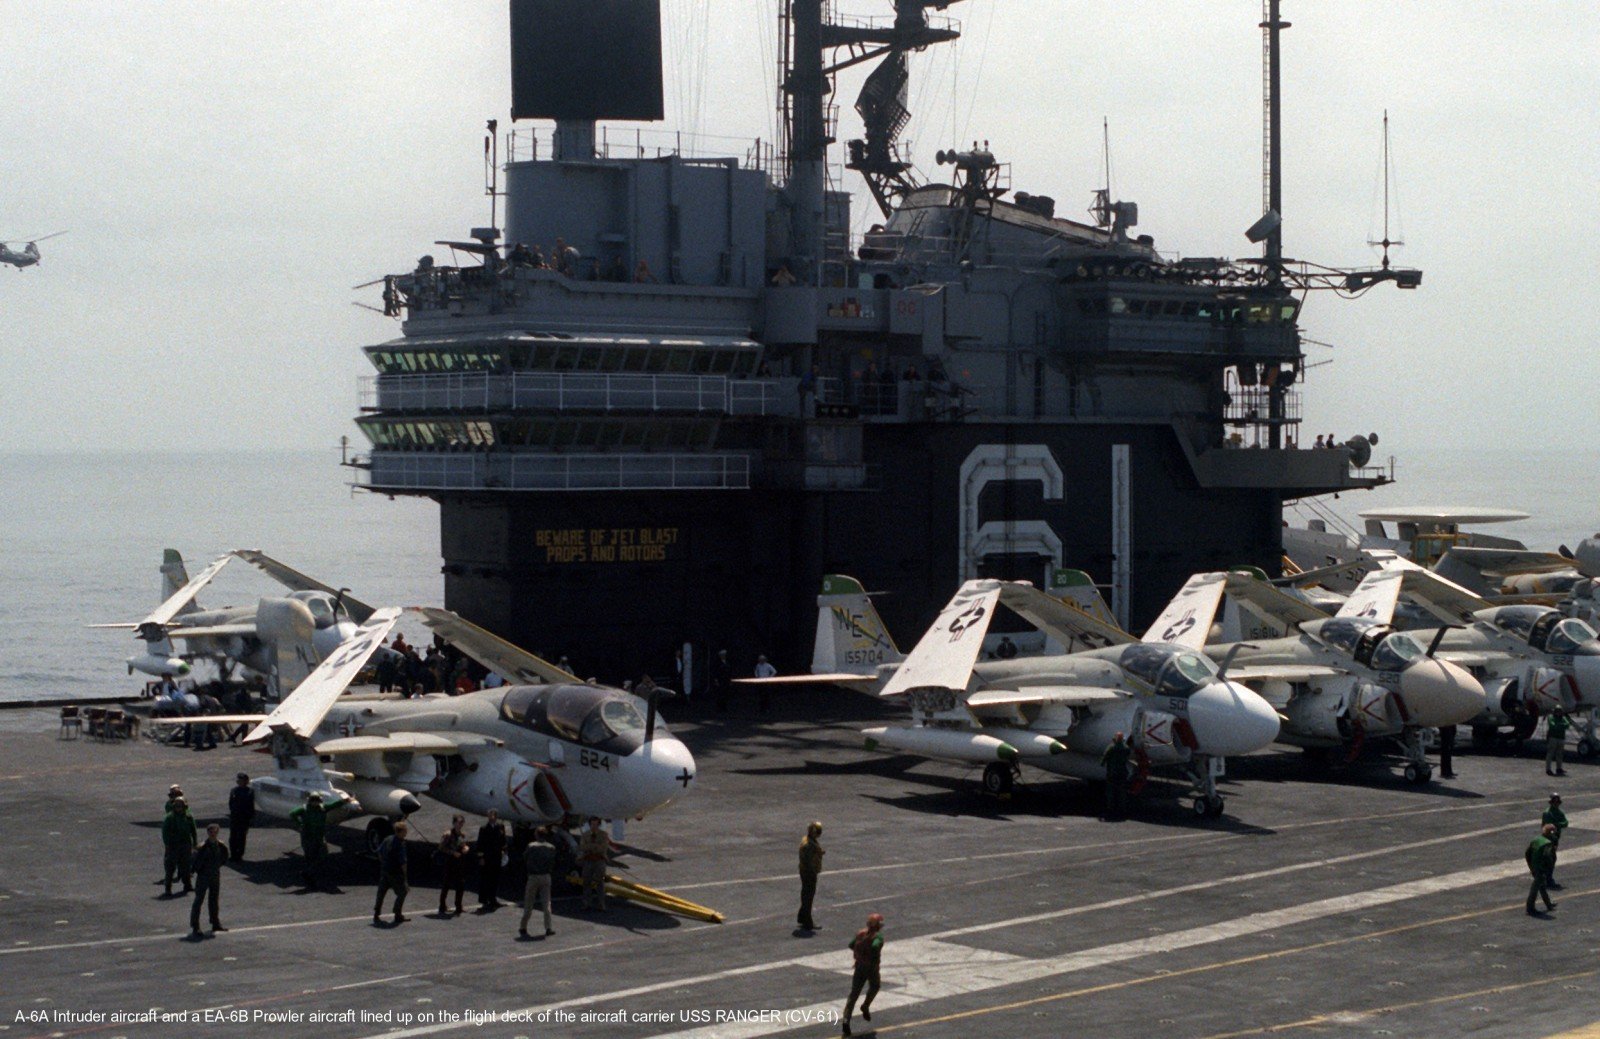 [Terminé] Vought A-7E Corsair II - 1/72 4t9g7p10